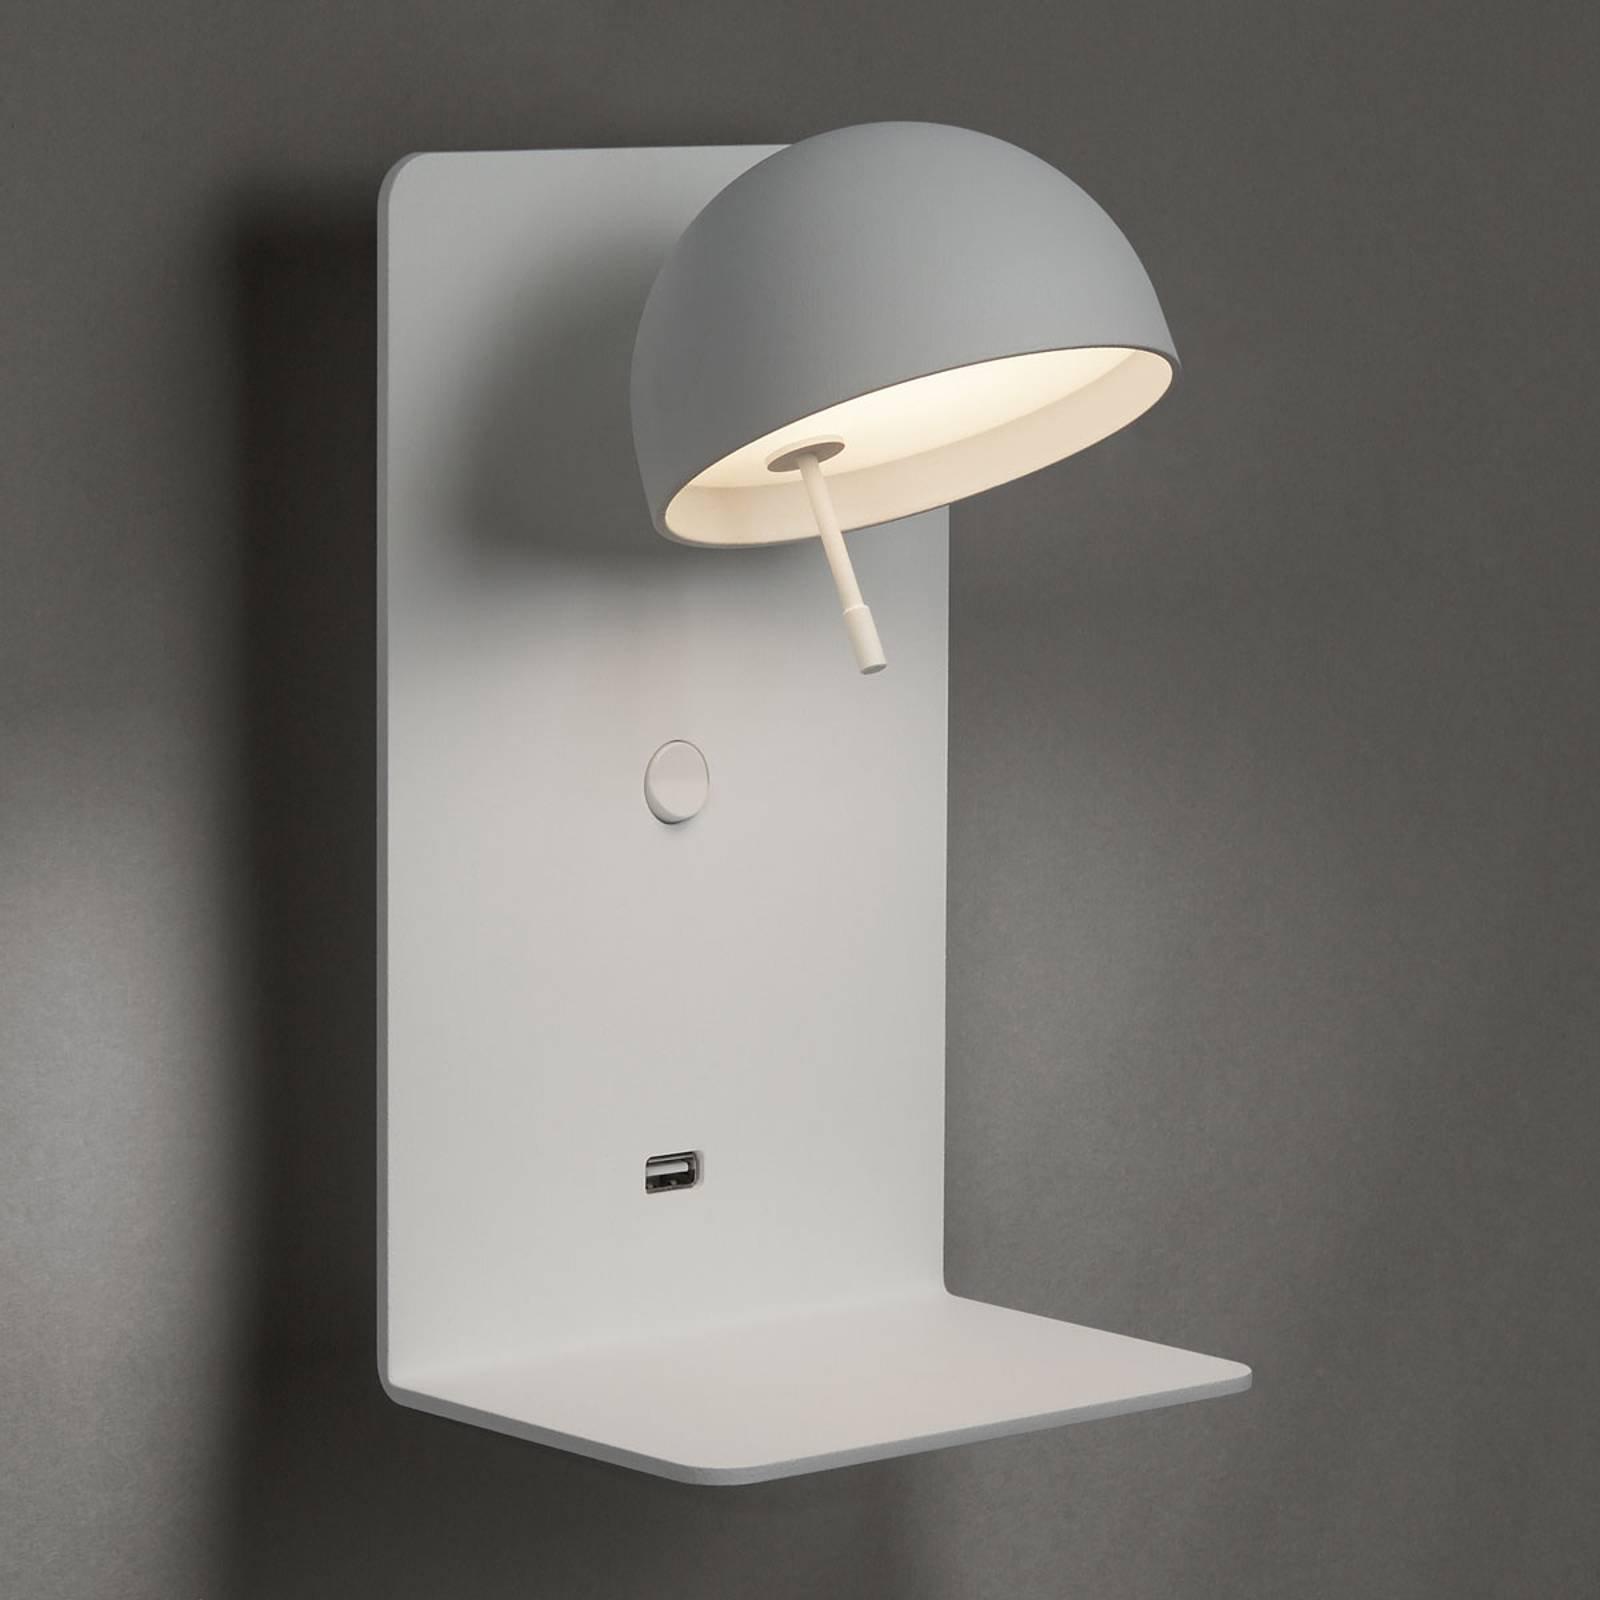 Bover Beddy A/02 LED-vegglampe hvit med USB-port